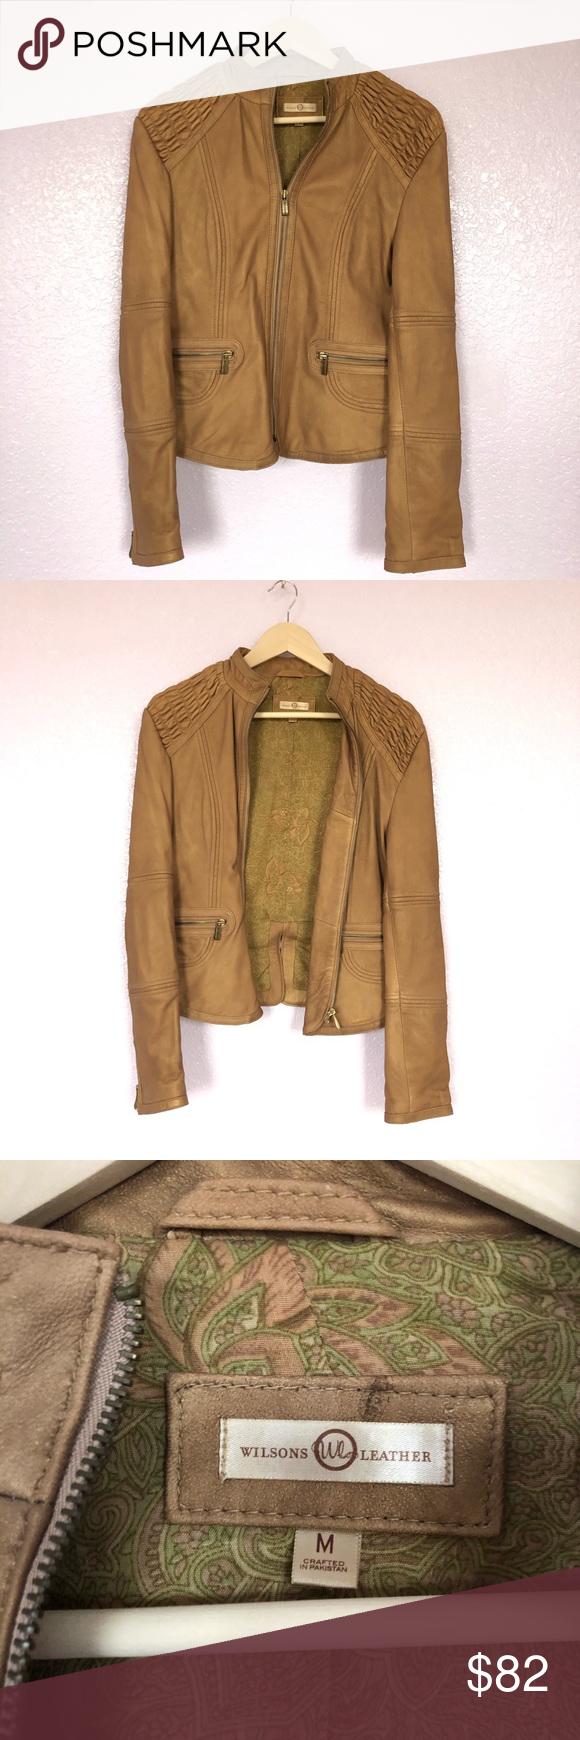 Wilson's leather moto jacket medium Leather moto jacket